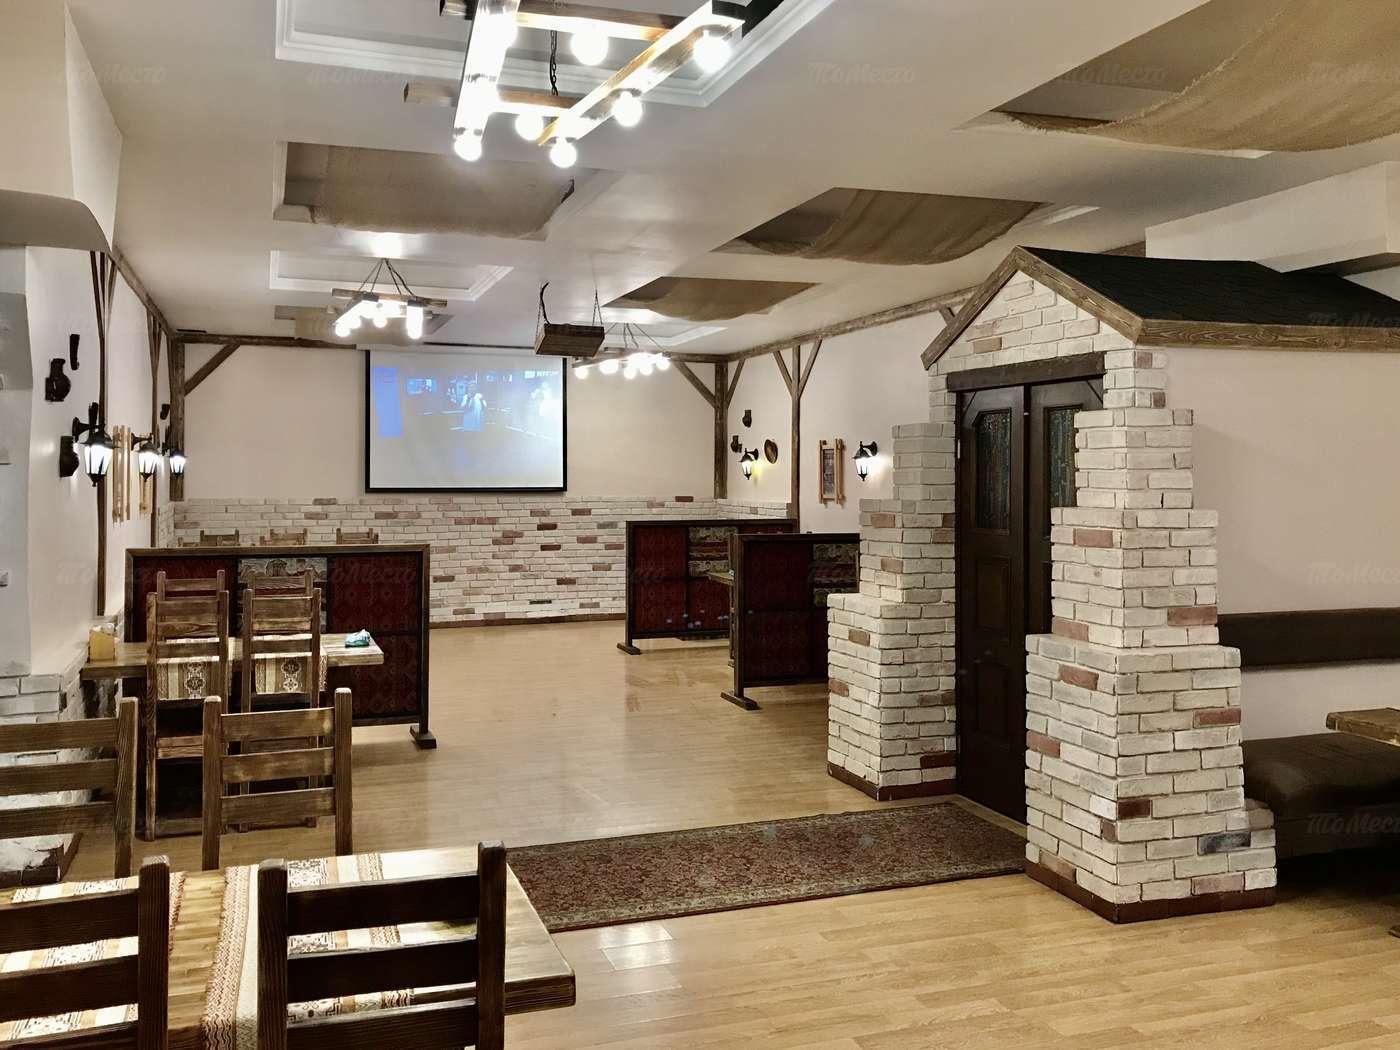 Ресторан Пандок на улице Нестерова фото 2